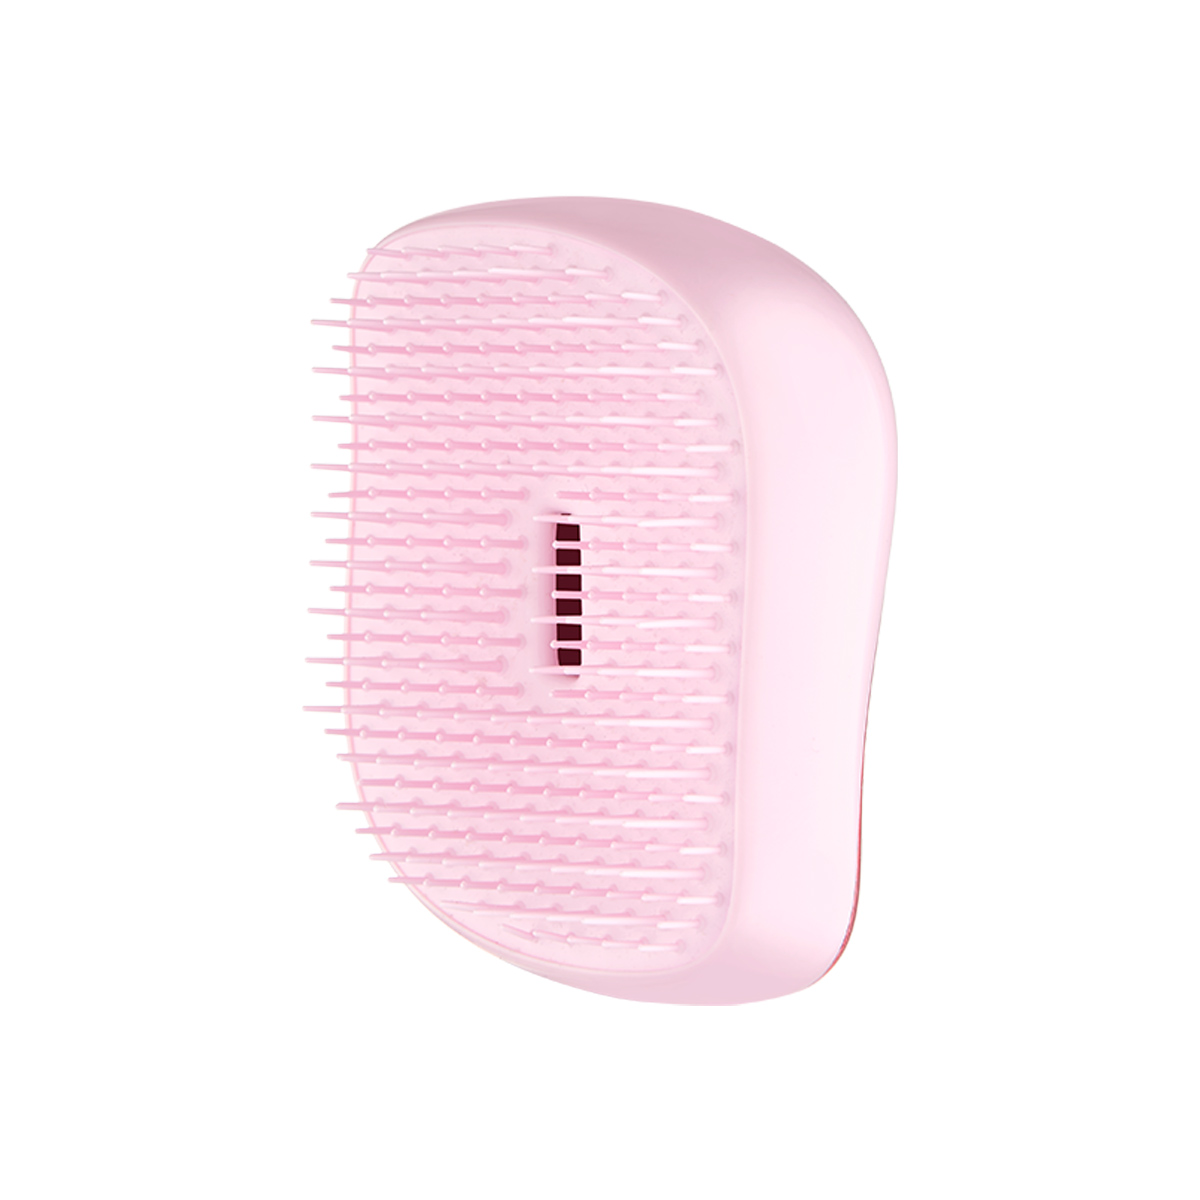 Купить Tangle Teezer Расческа Baby Doll Pink Chrome (Tangle Teezer, Compact Styler), Великобритания